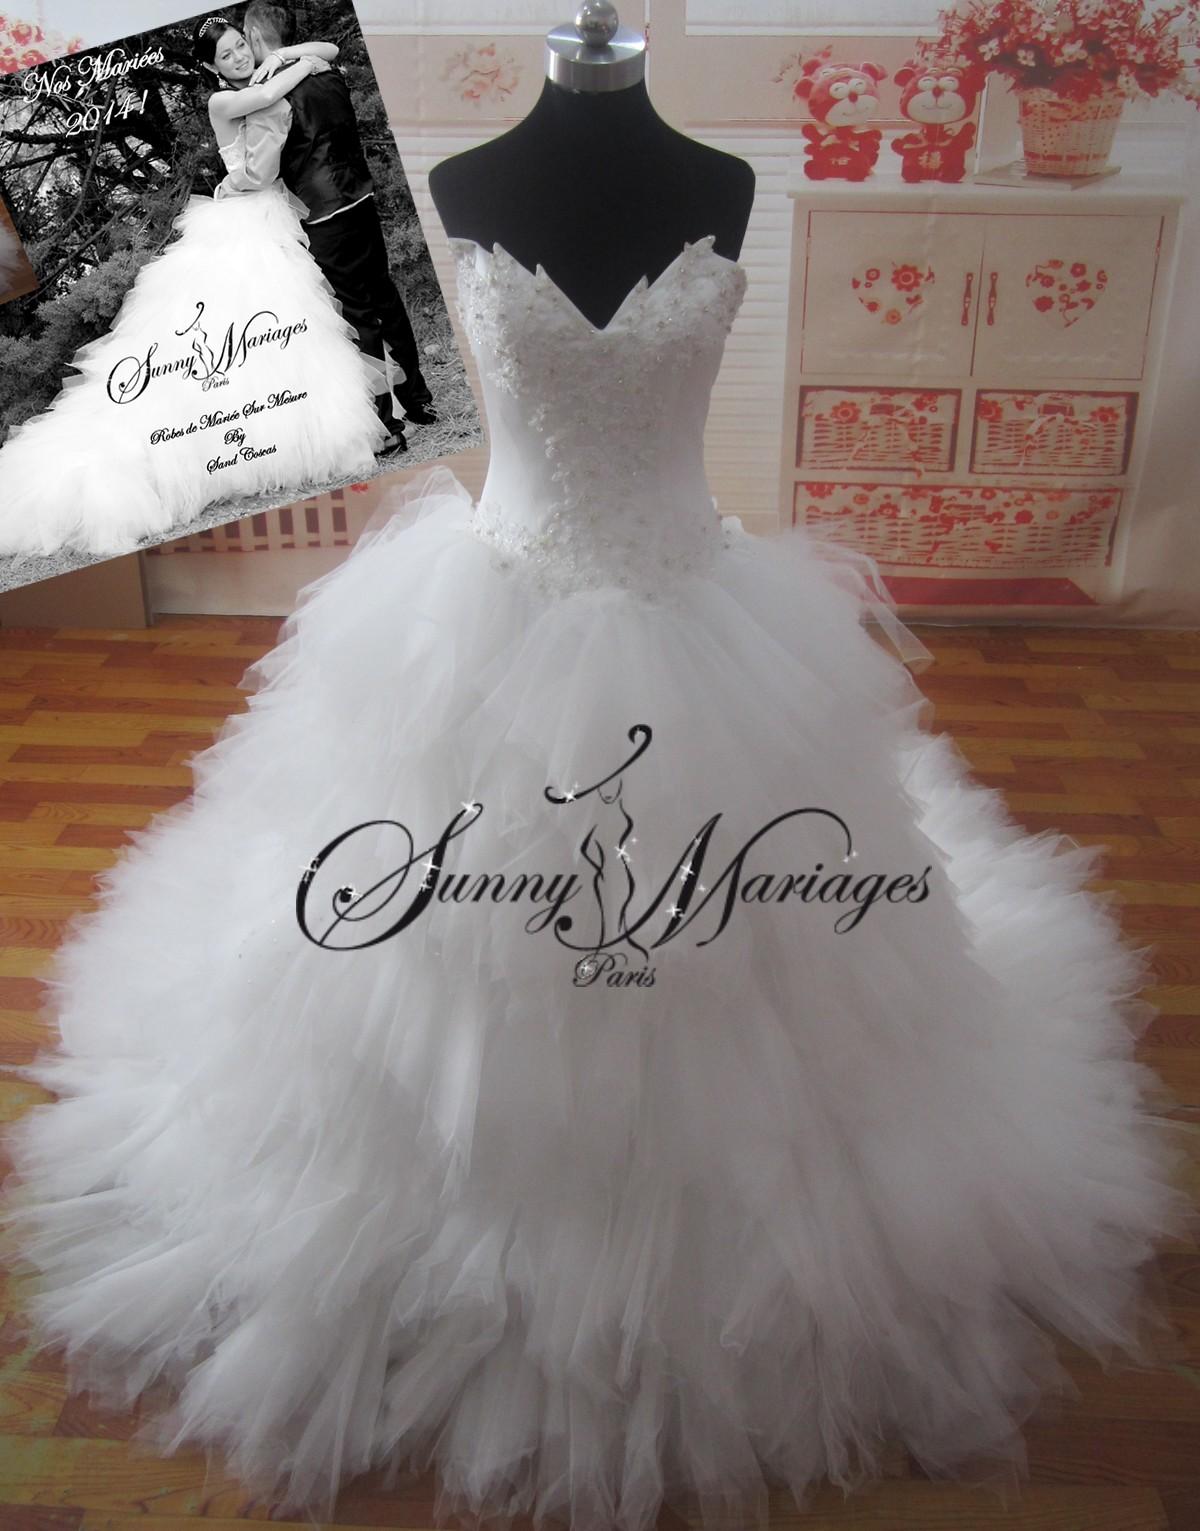 robe de mariee bustier pointe jupe mouchoirs de tulles robe de mariee princesse pas cher robe. Black Bedroom Furniture Sets. Home Design Ideas